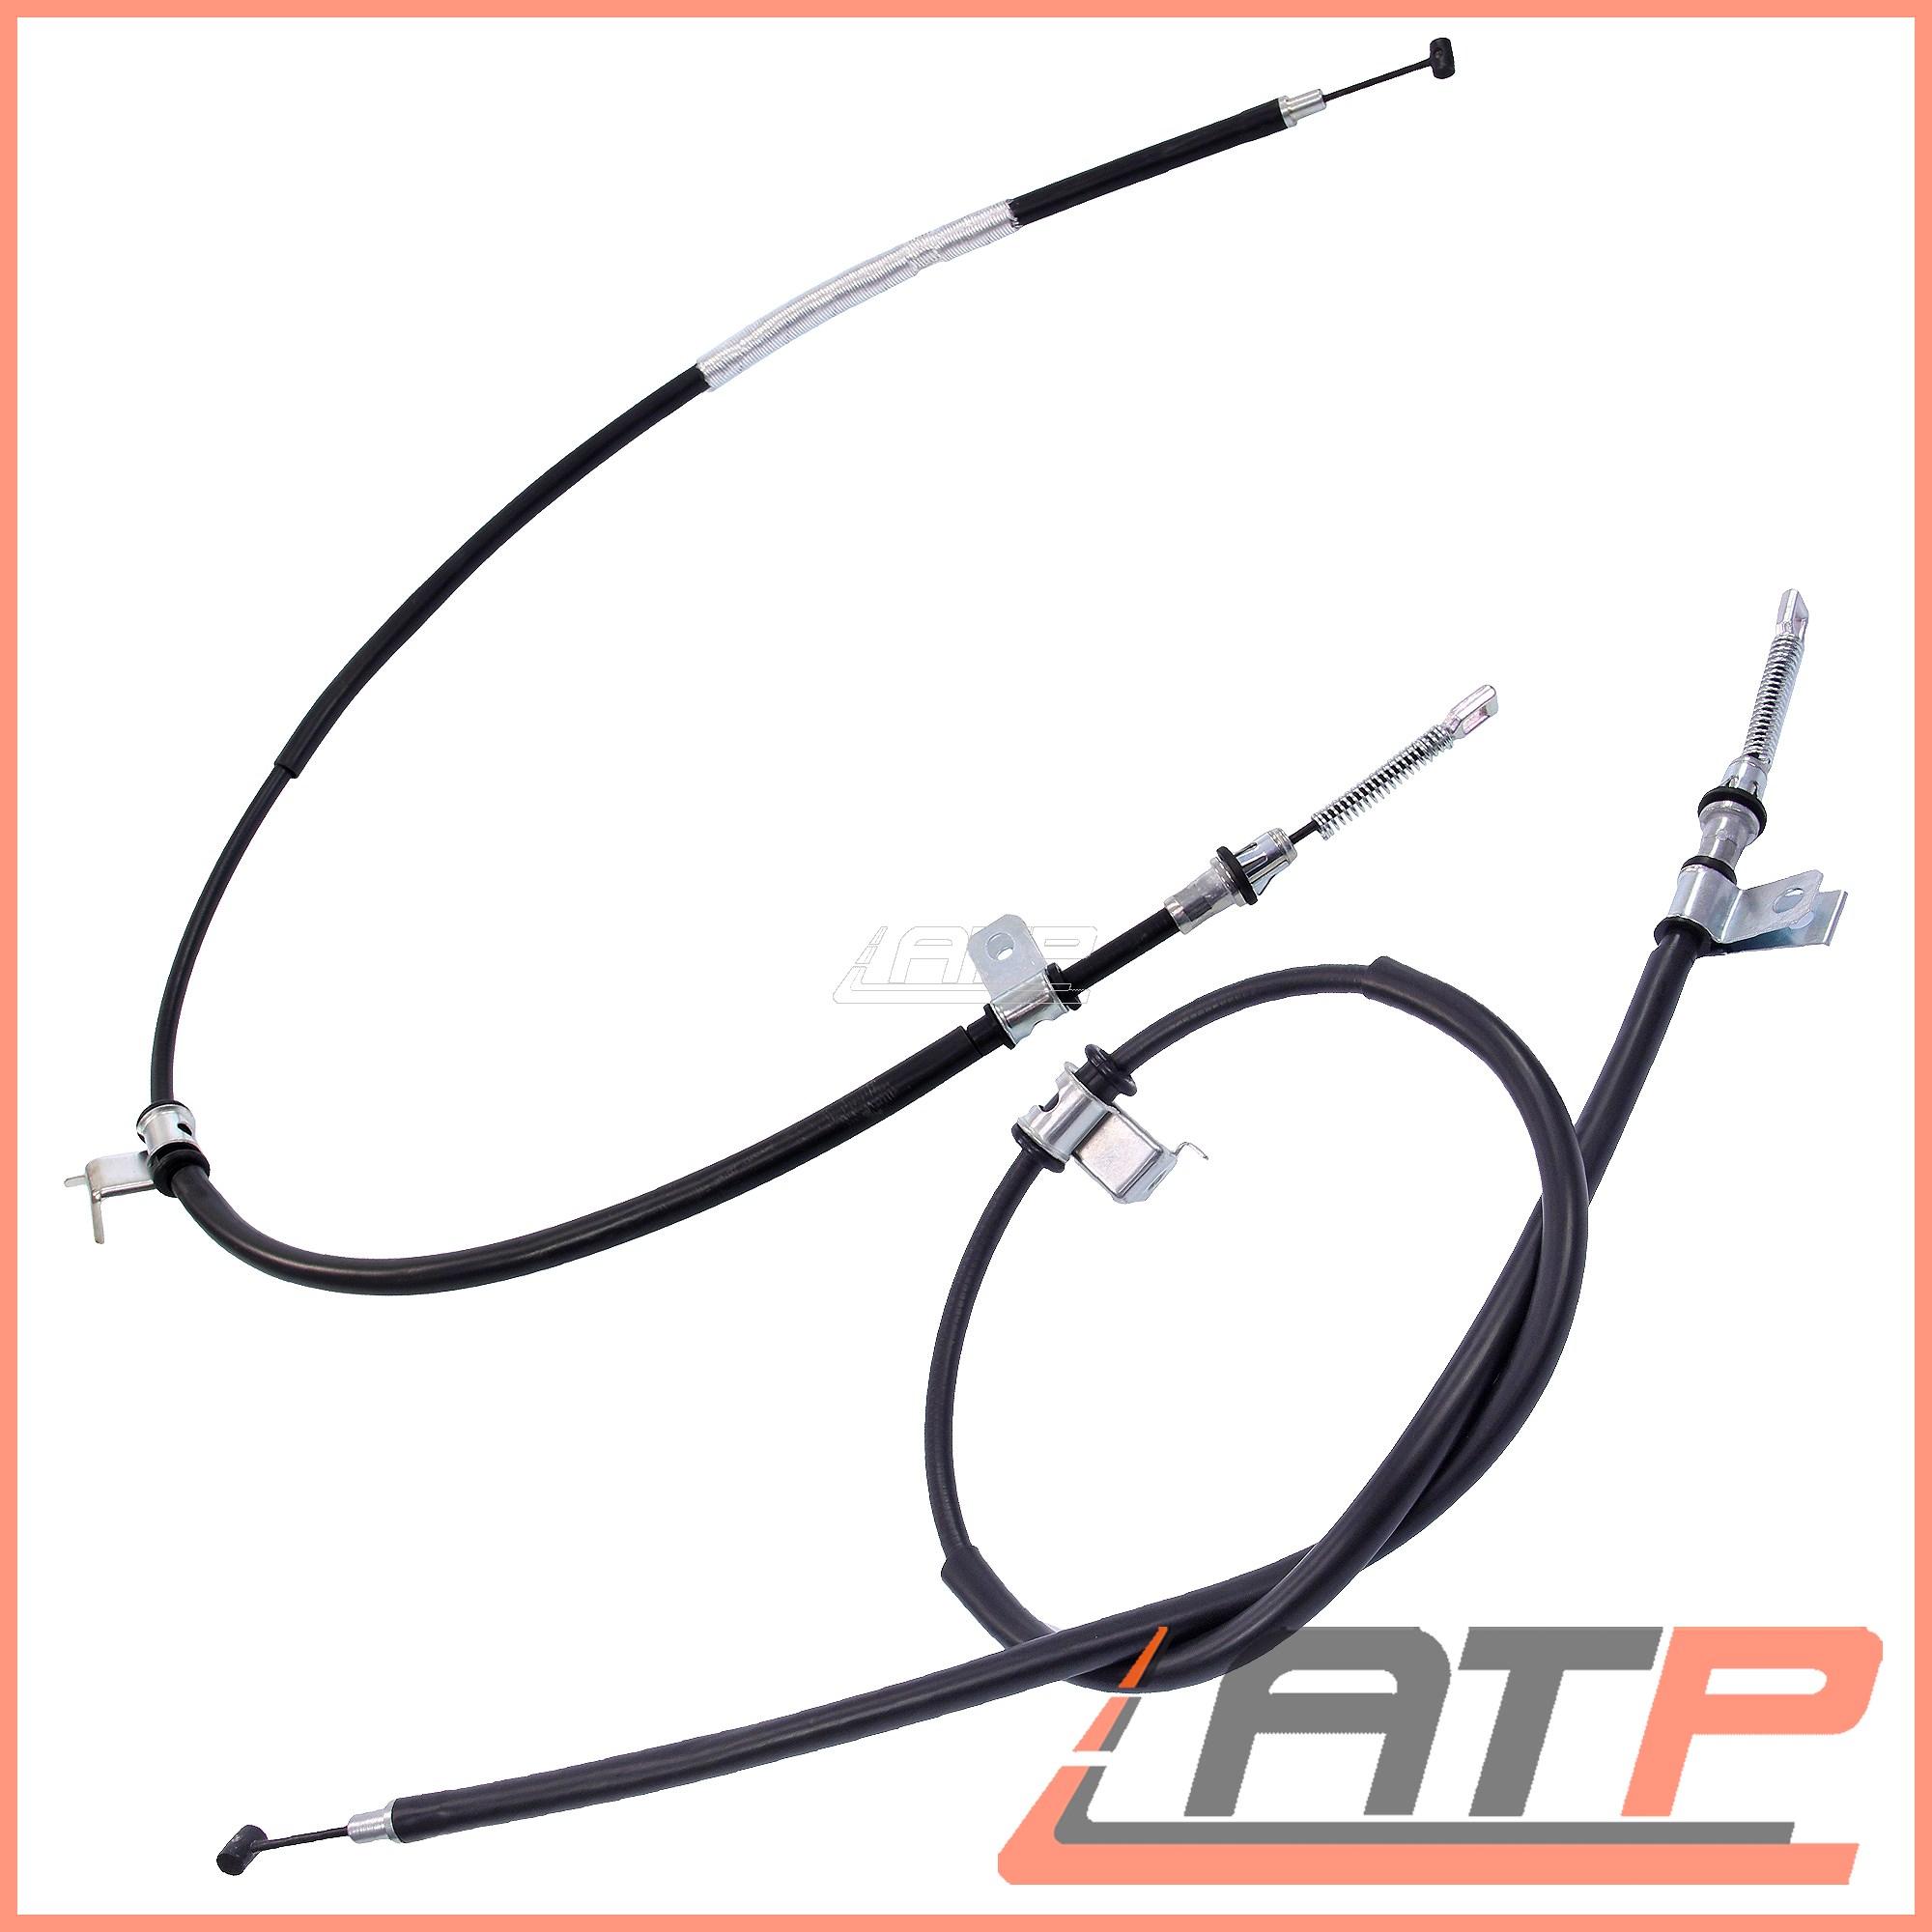 RIGHT REAR CHEVROLET CAPTIVA 06 2X HANDBRAKE CABLE LEFT